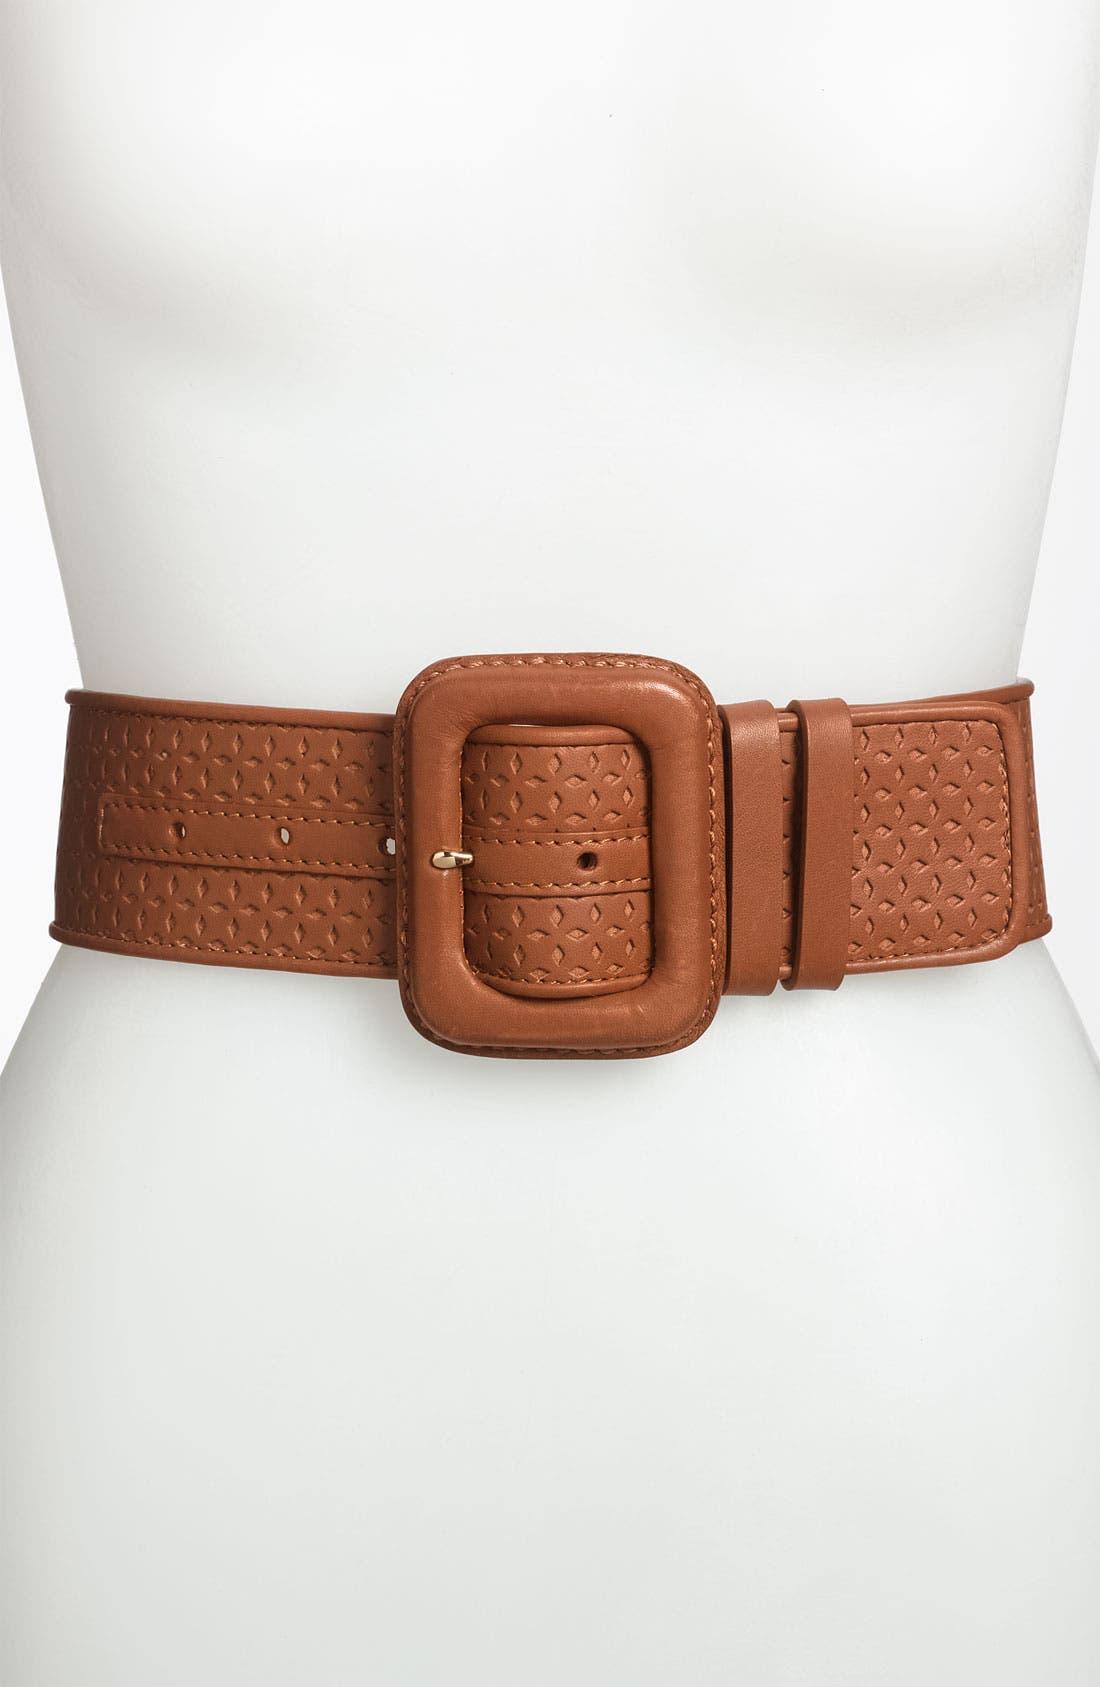 Alternate Image 1 Selected - Cole Haan 'Vintage Valise' Belt